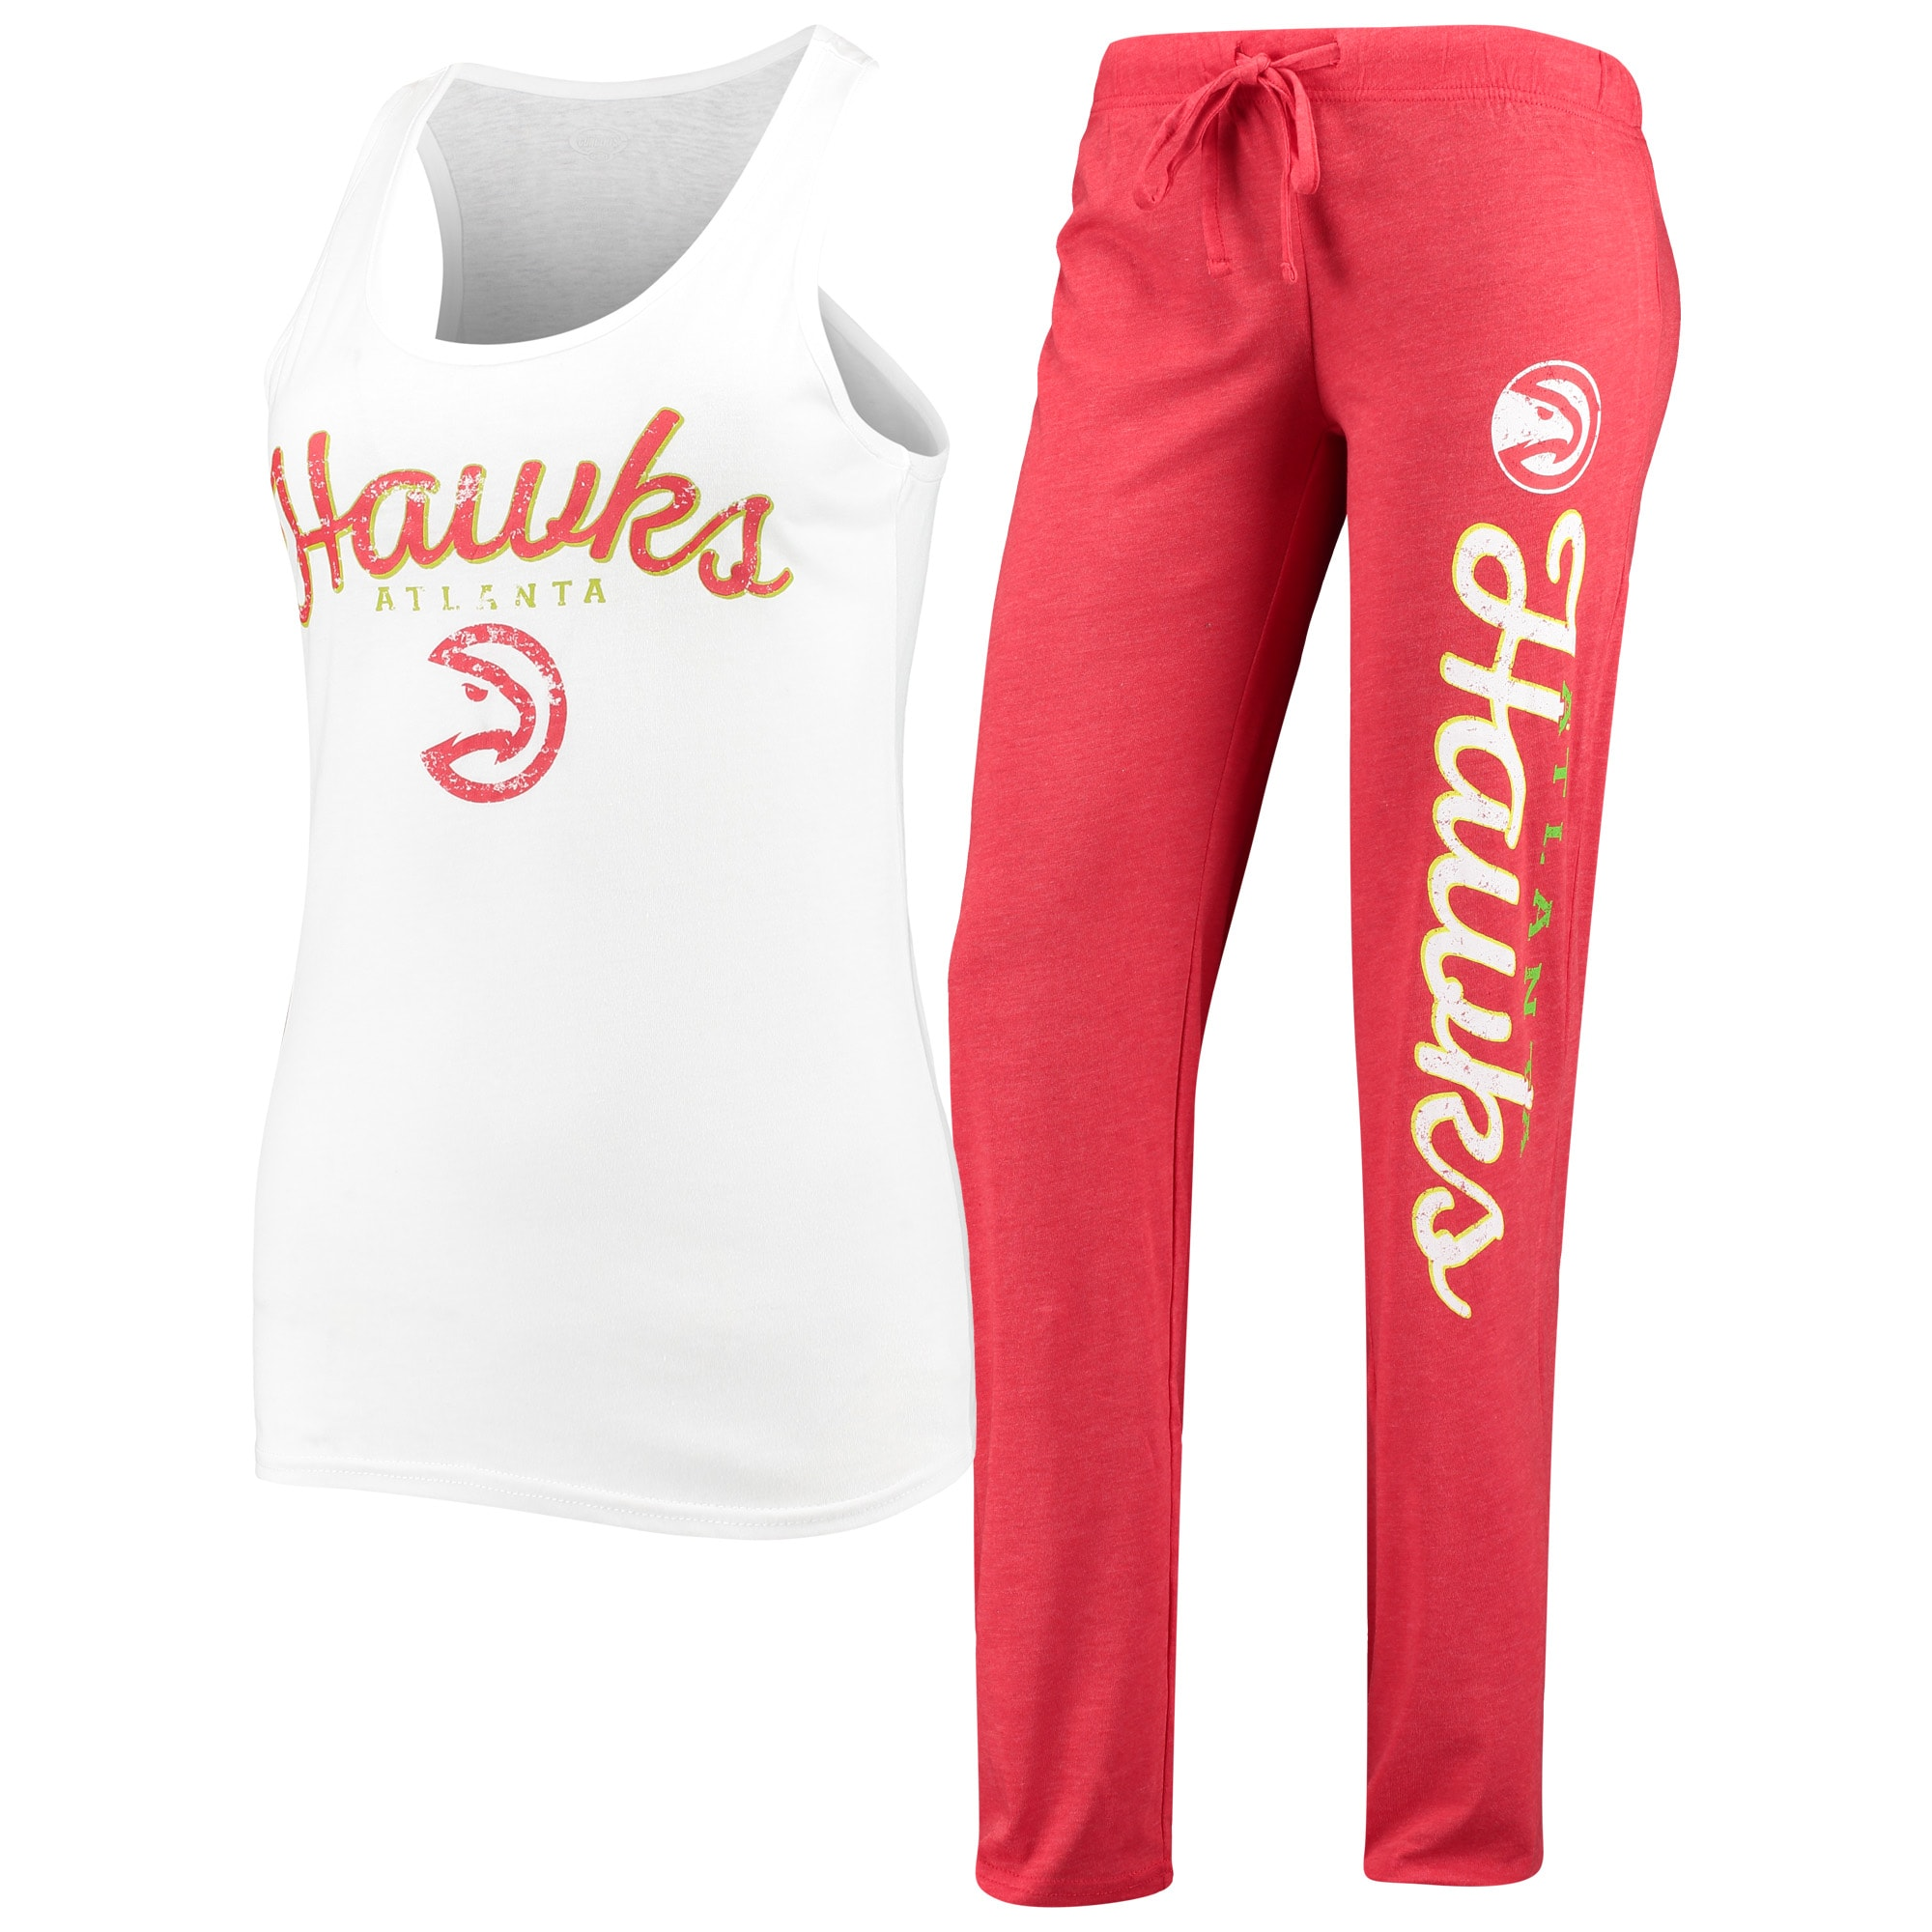 Atlanta Hawks Concepts Sport Women's Topic Tank Top & Pants Sleep Set - White/Red